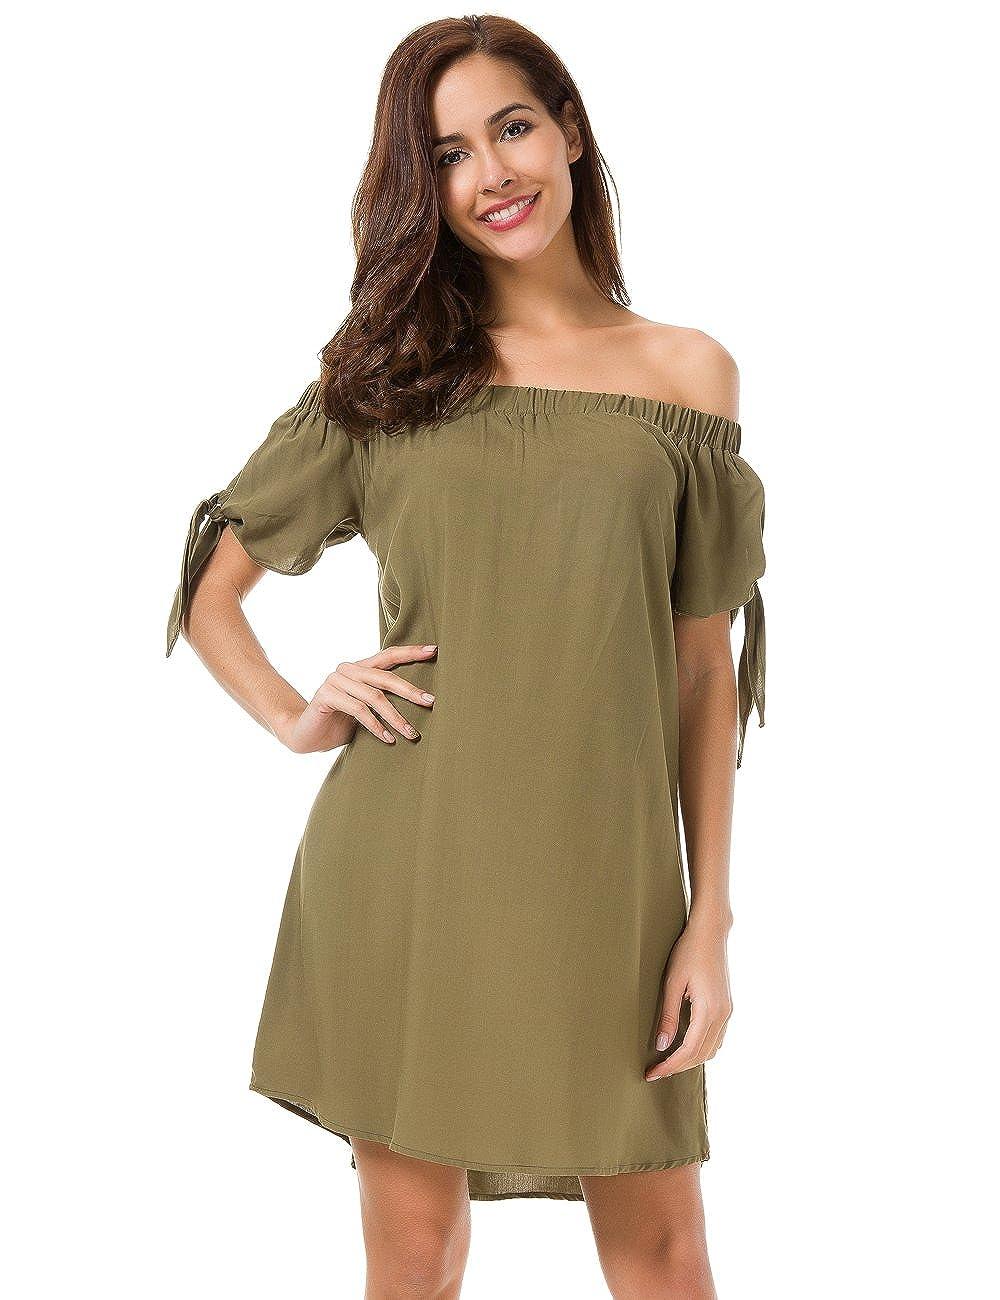 61fcdffd06d7 MRLZ Womens Off Shoulder Dress Loose Short Sleeve Strapless Mini Shirt  Dresses at Amazon Women s Clothing store